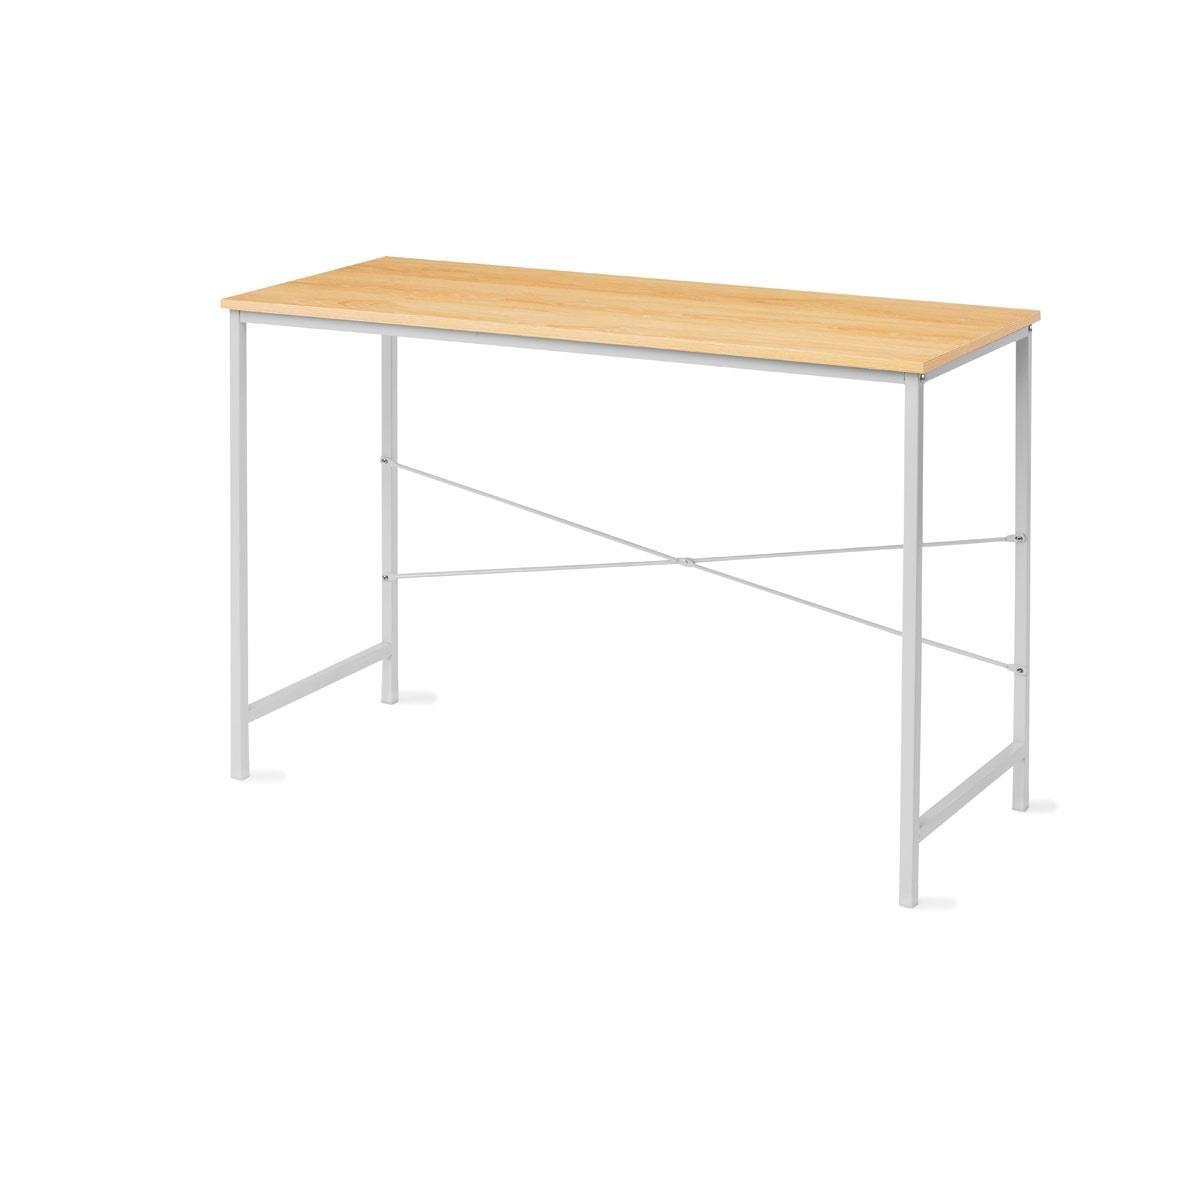 Kmart Foyer Table : Scandi essential desk kmart